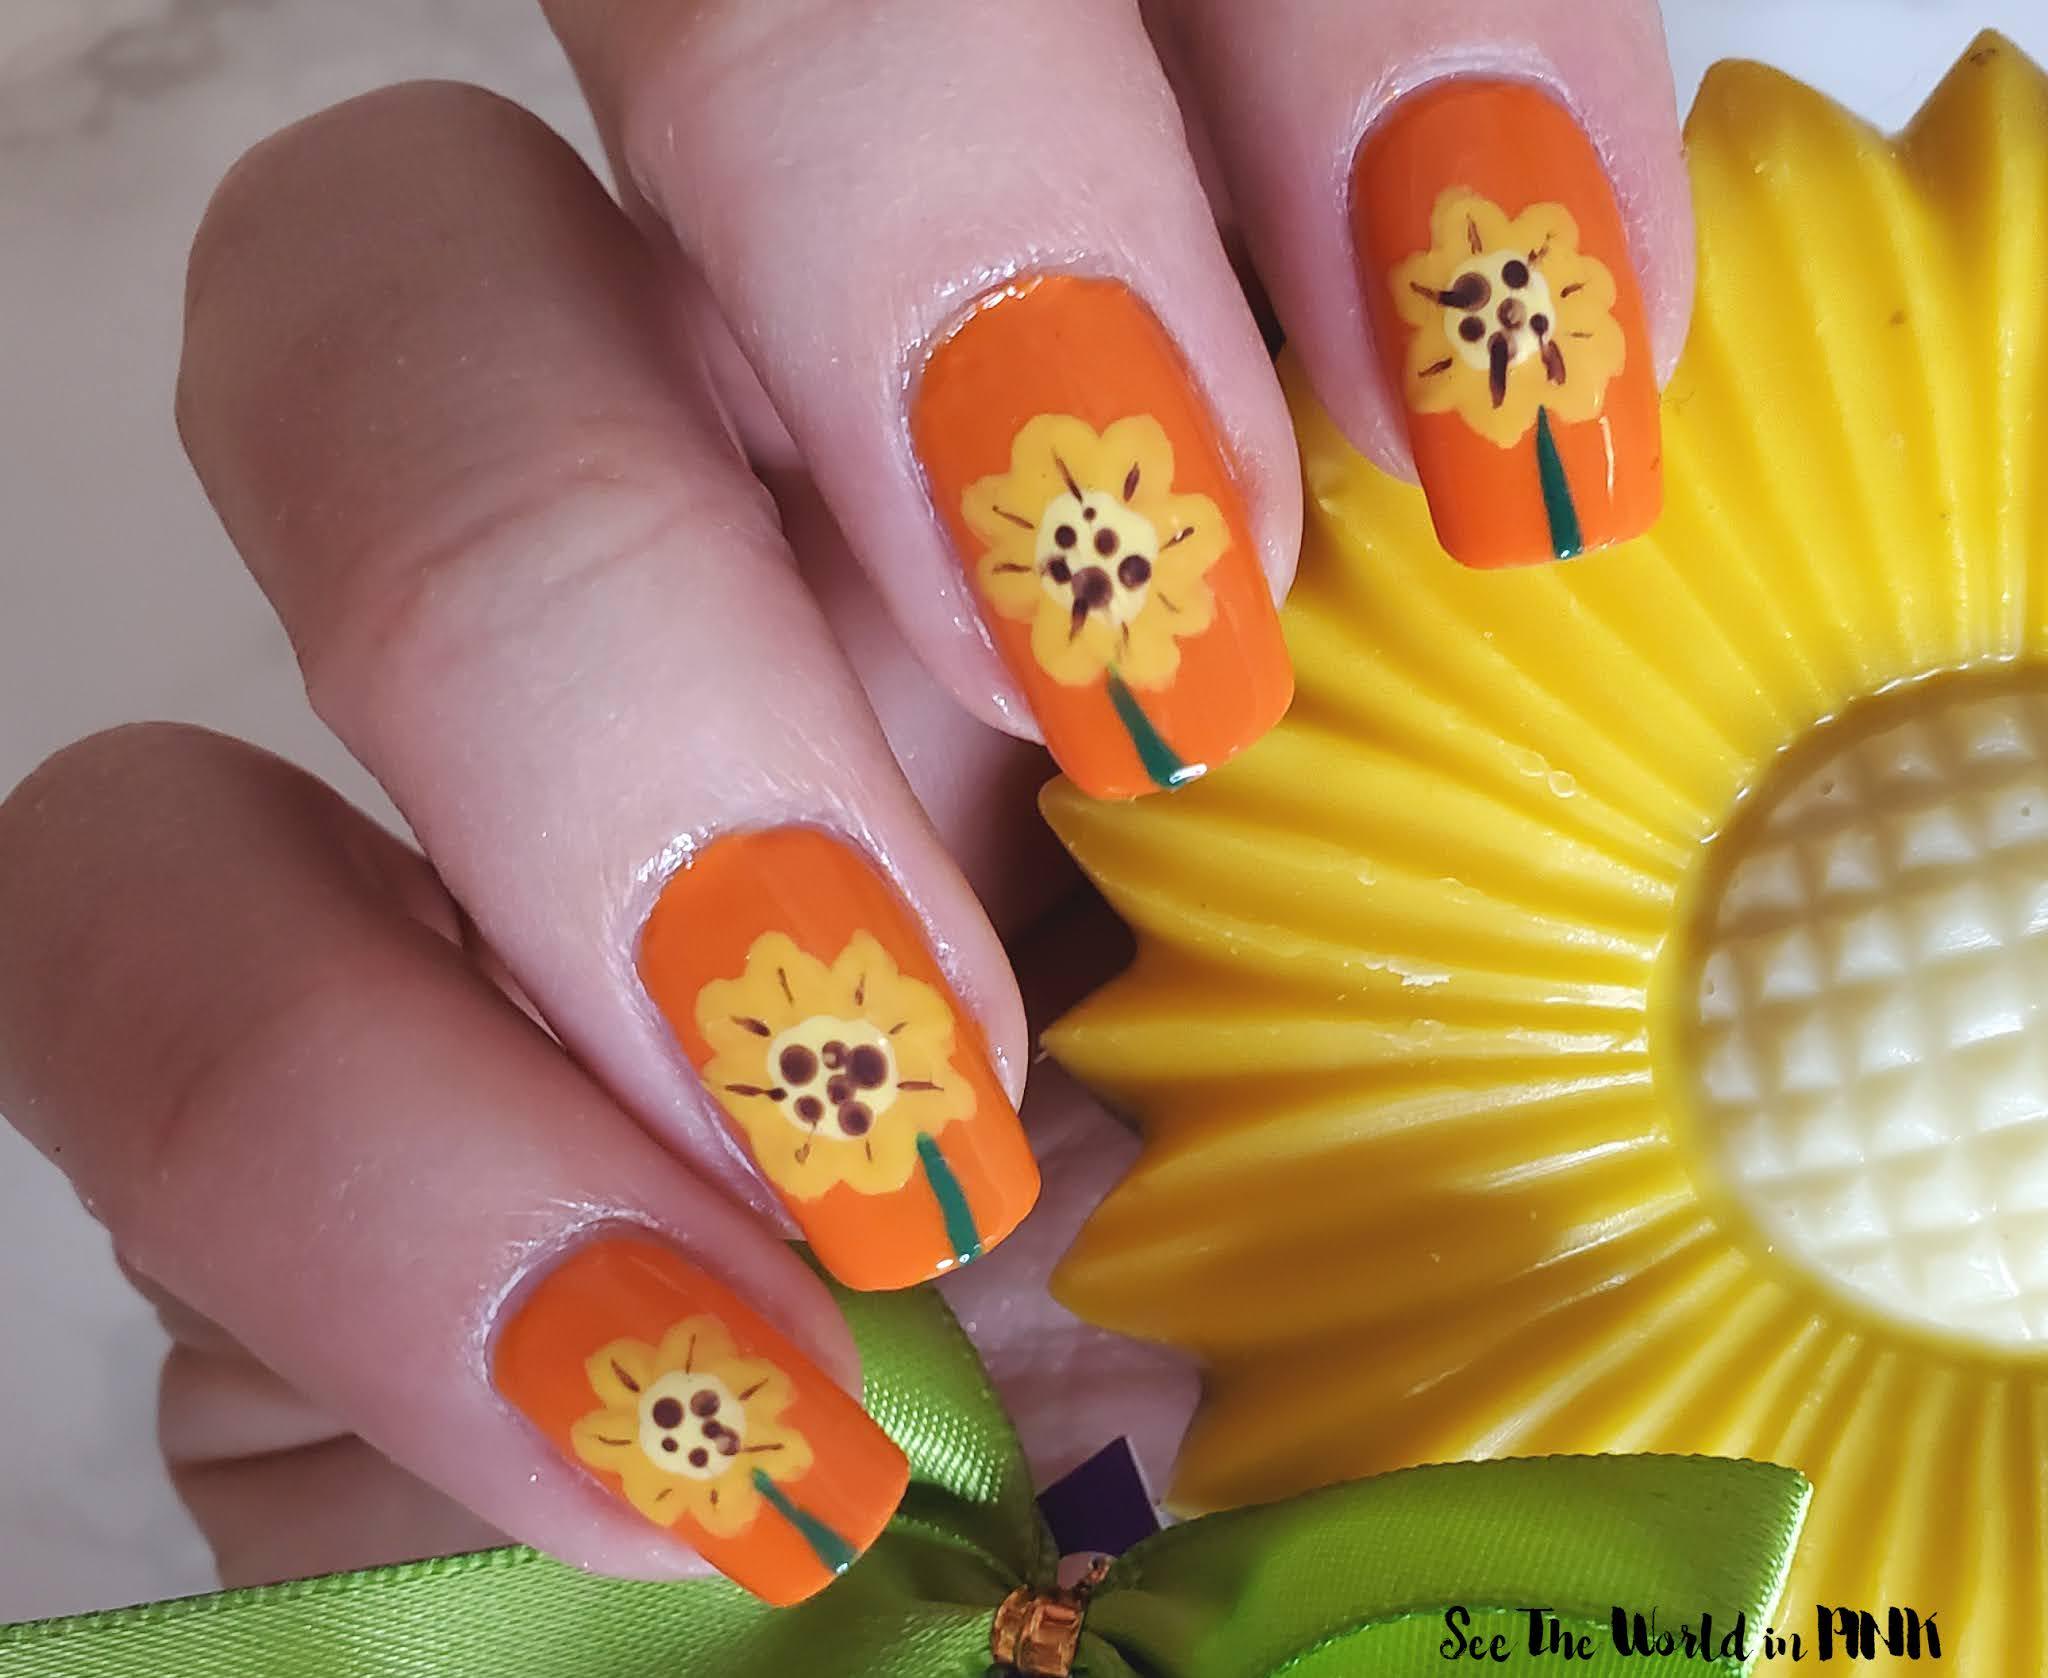 Manicure Monday - Sunflower Nails